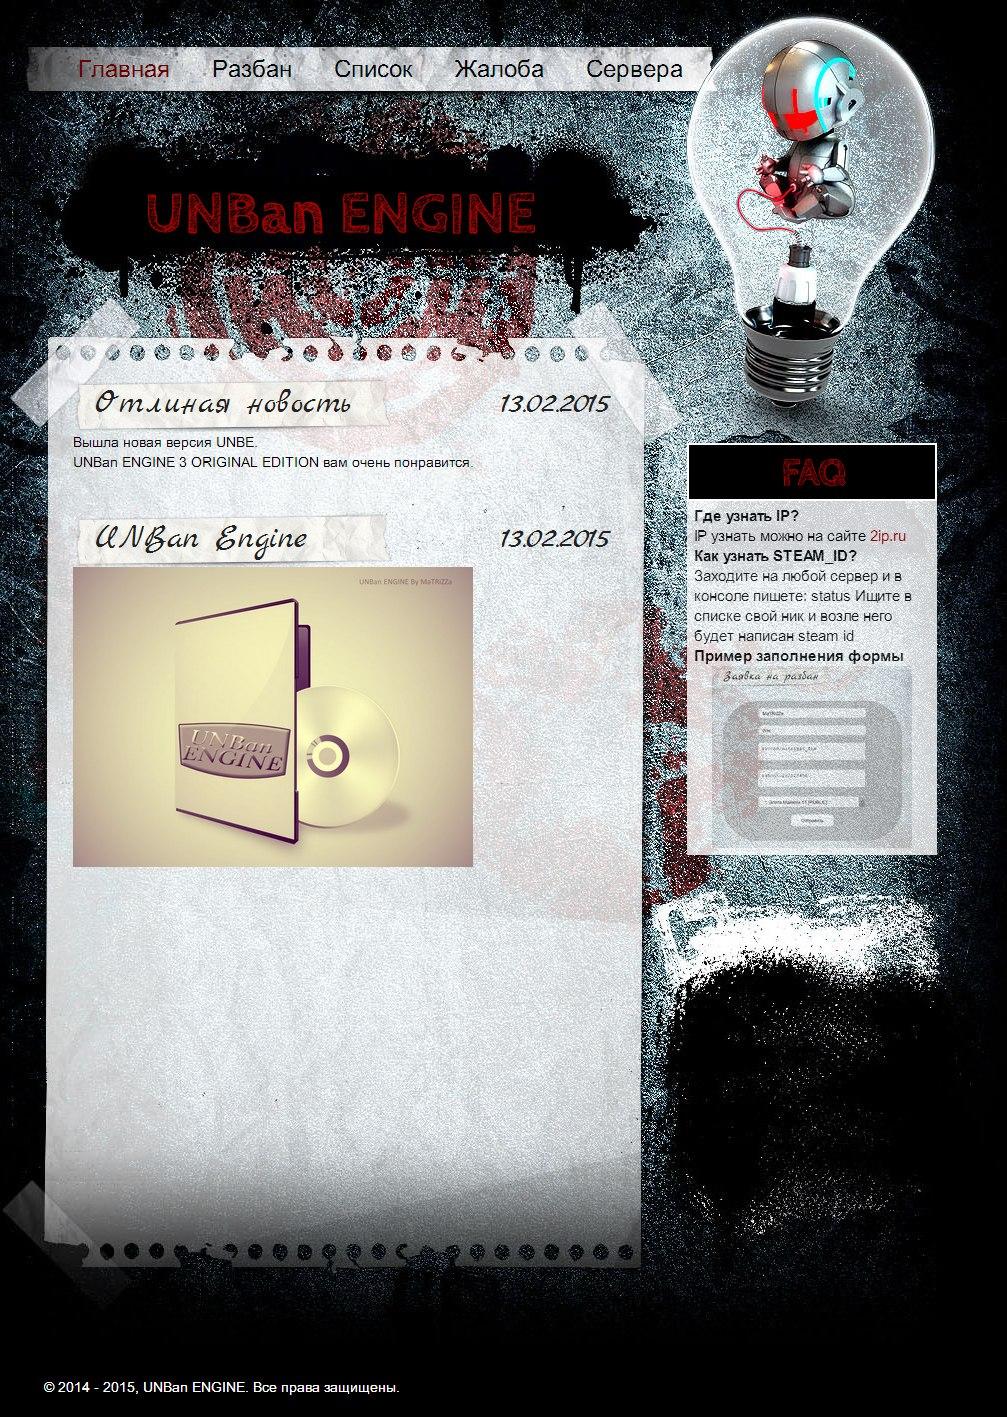 UNBan ENGINE 3 ORIGINAL EDITION